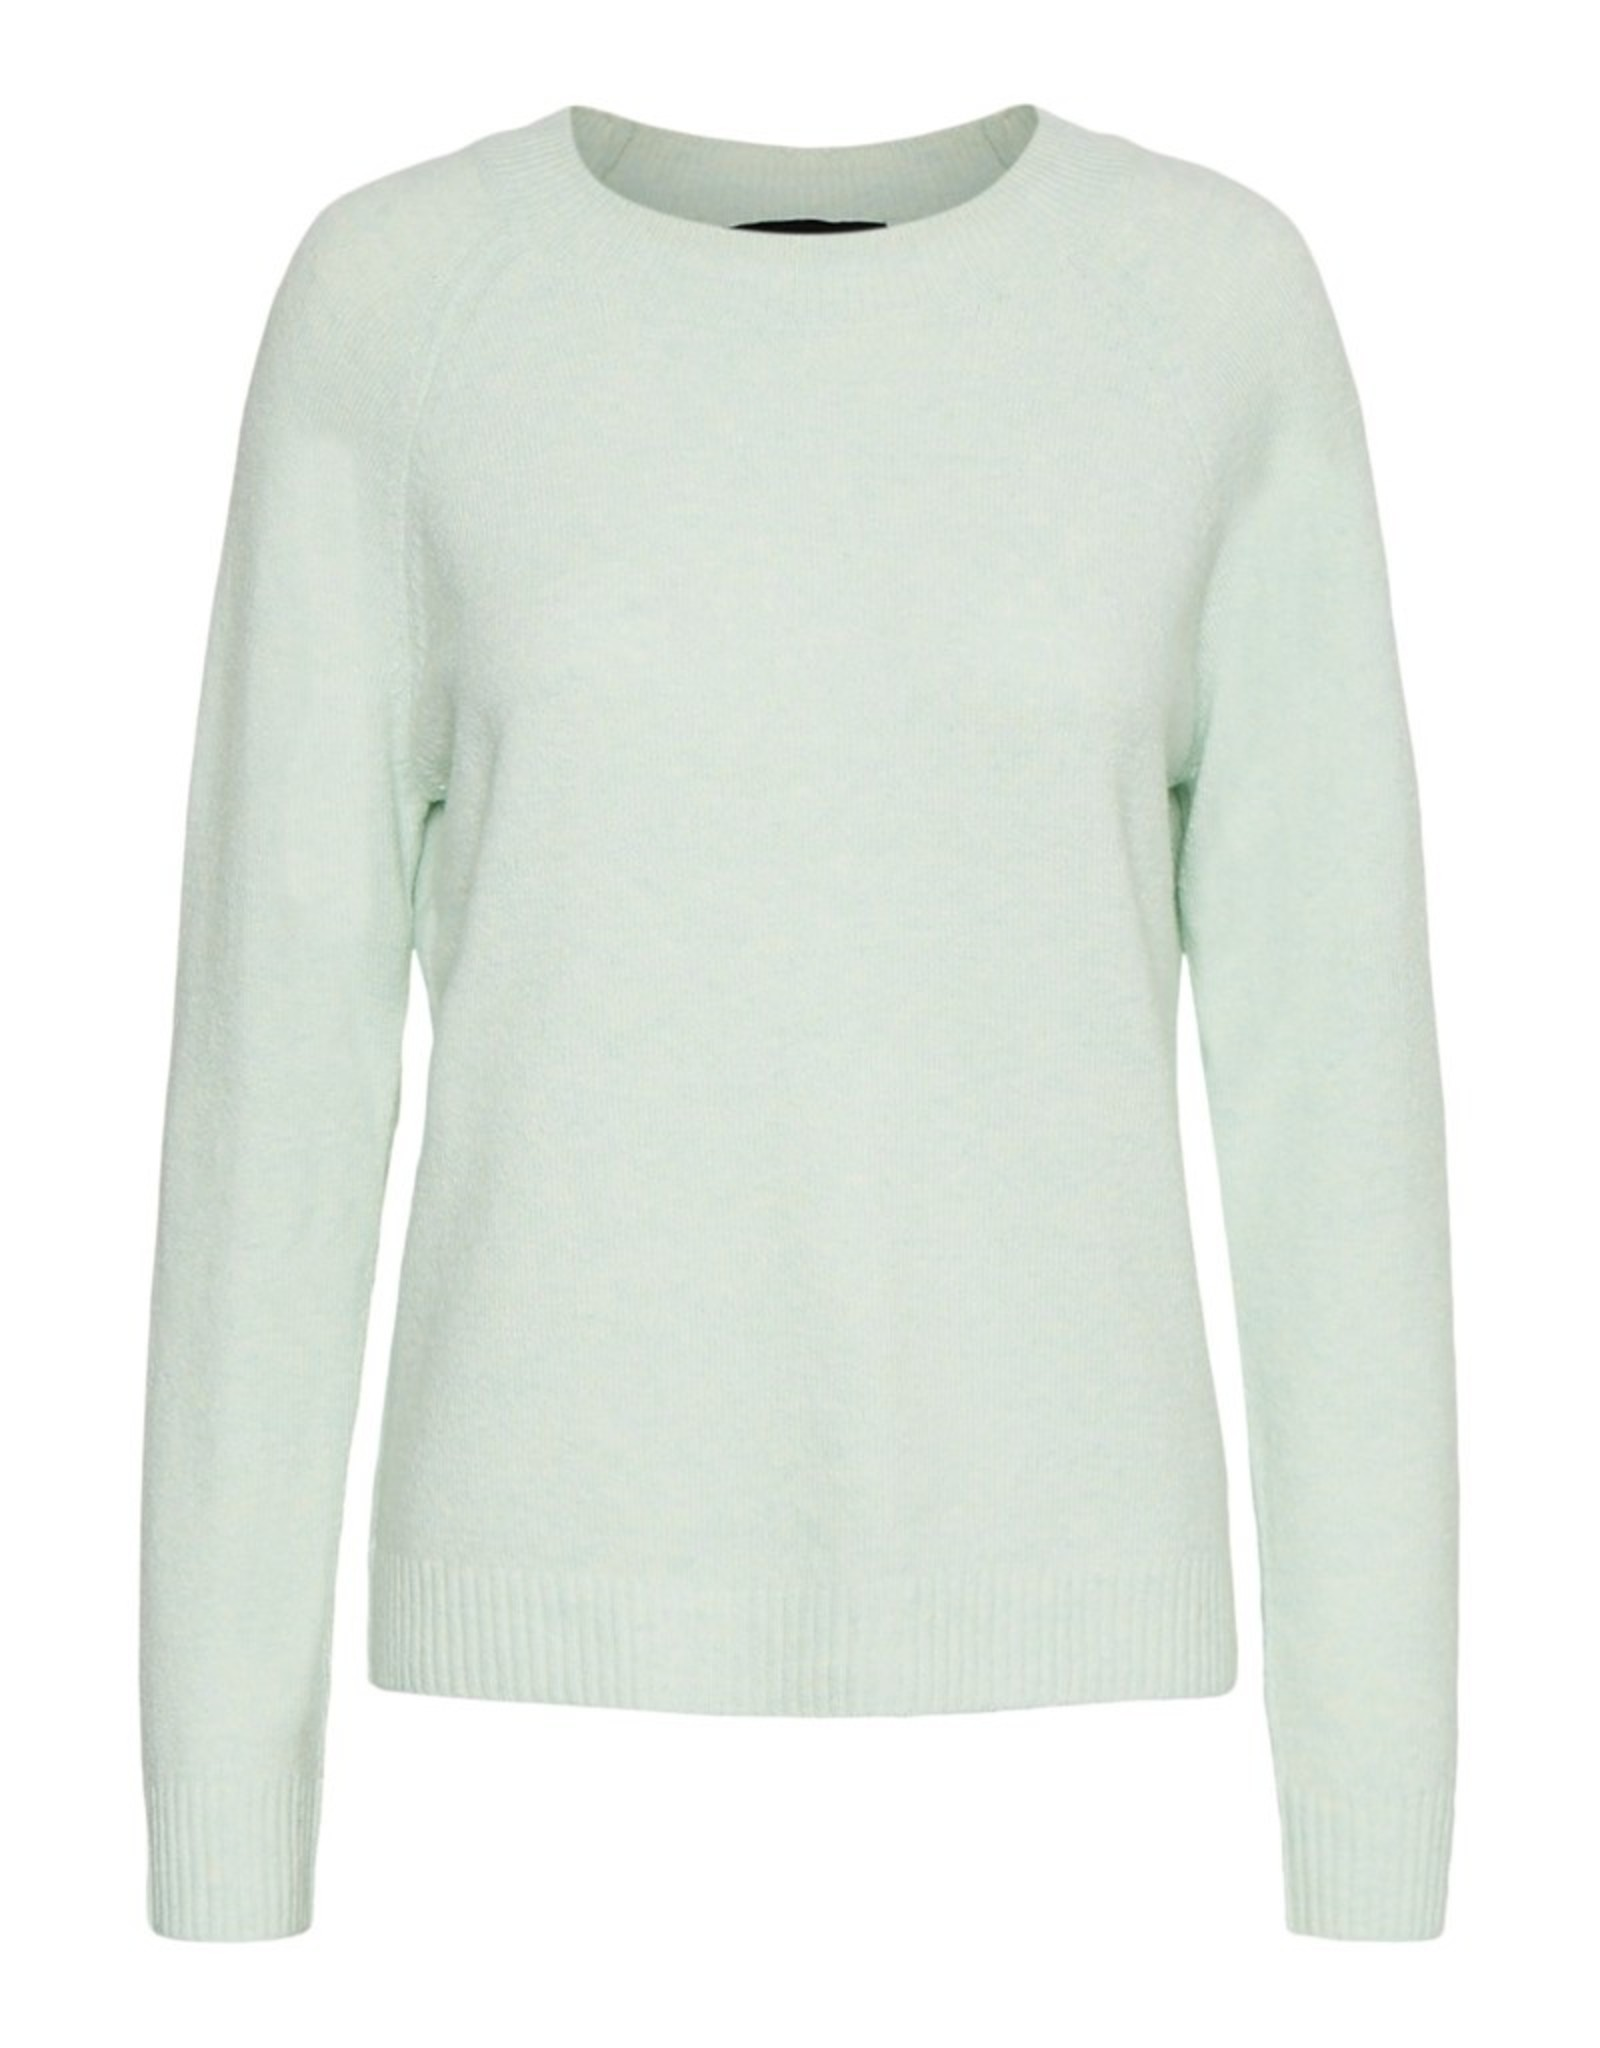 Vero Moda Doffy Sweater Sprucestone